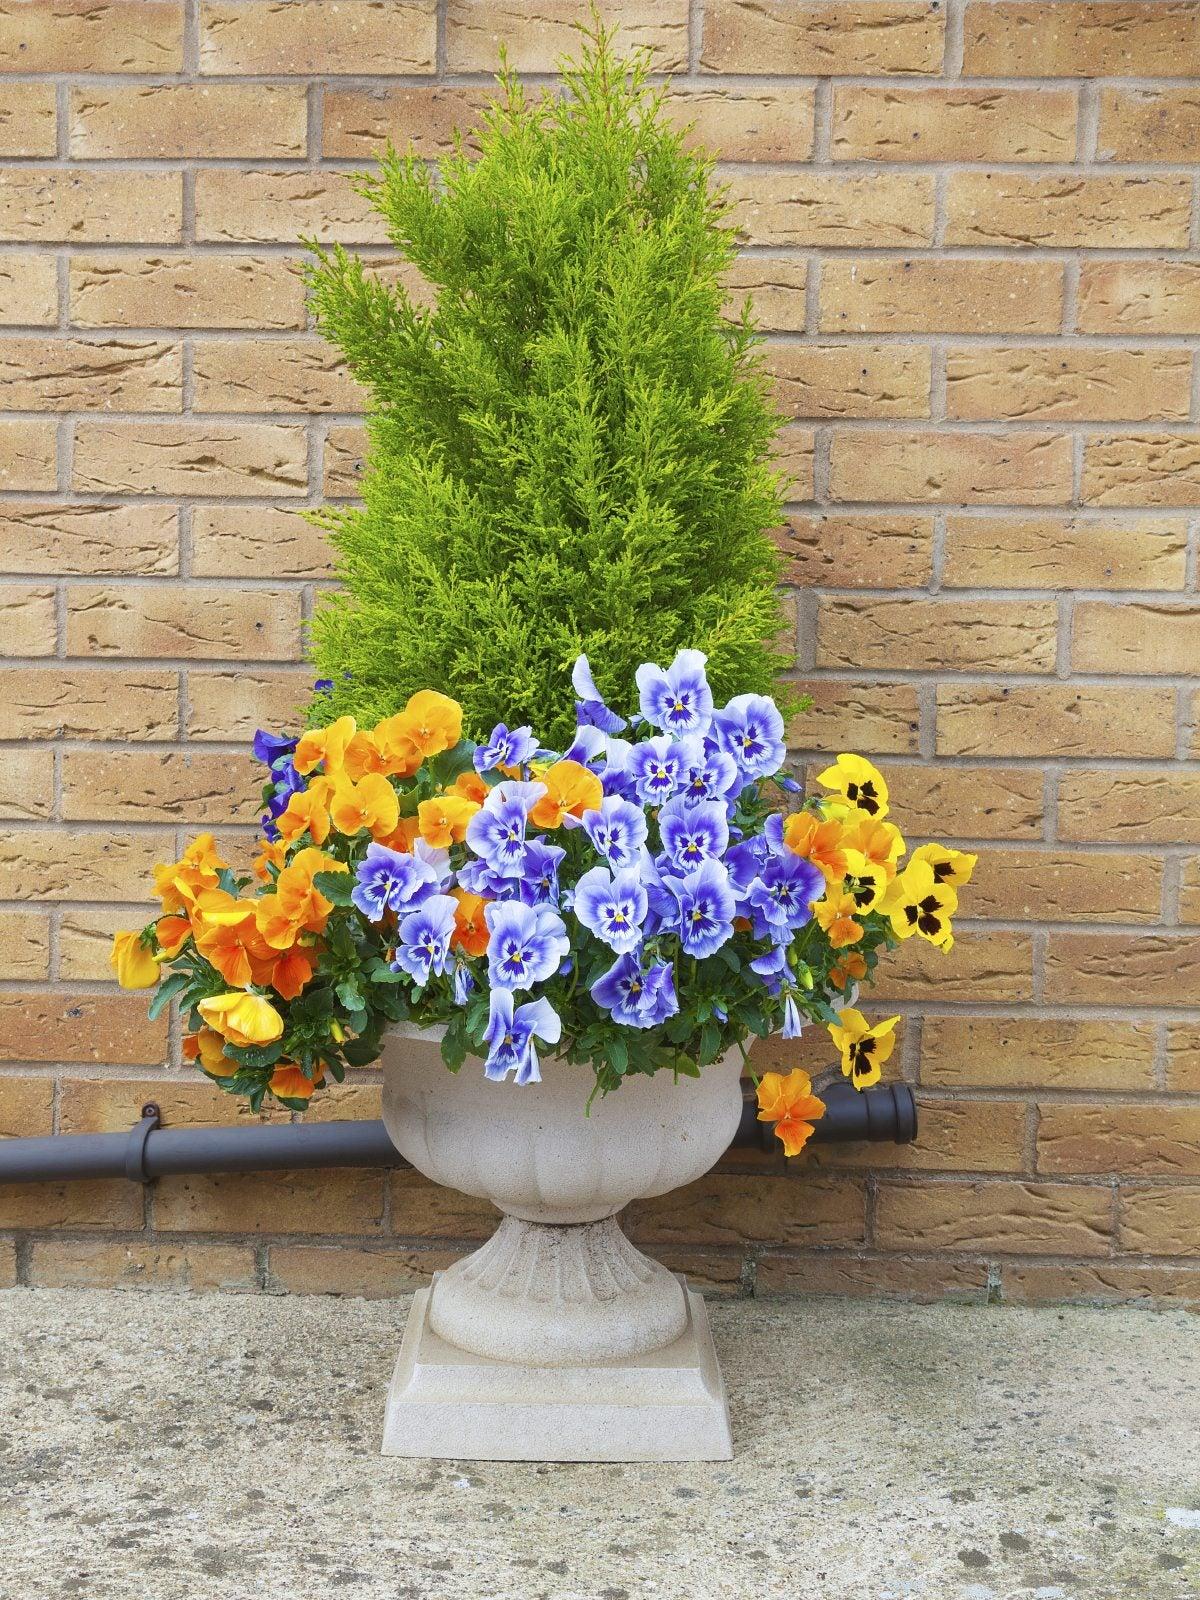 winter container garden ideas: tips for container